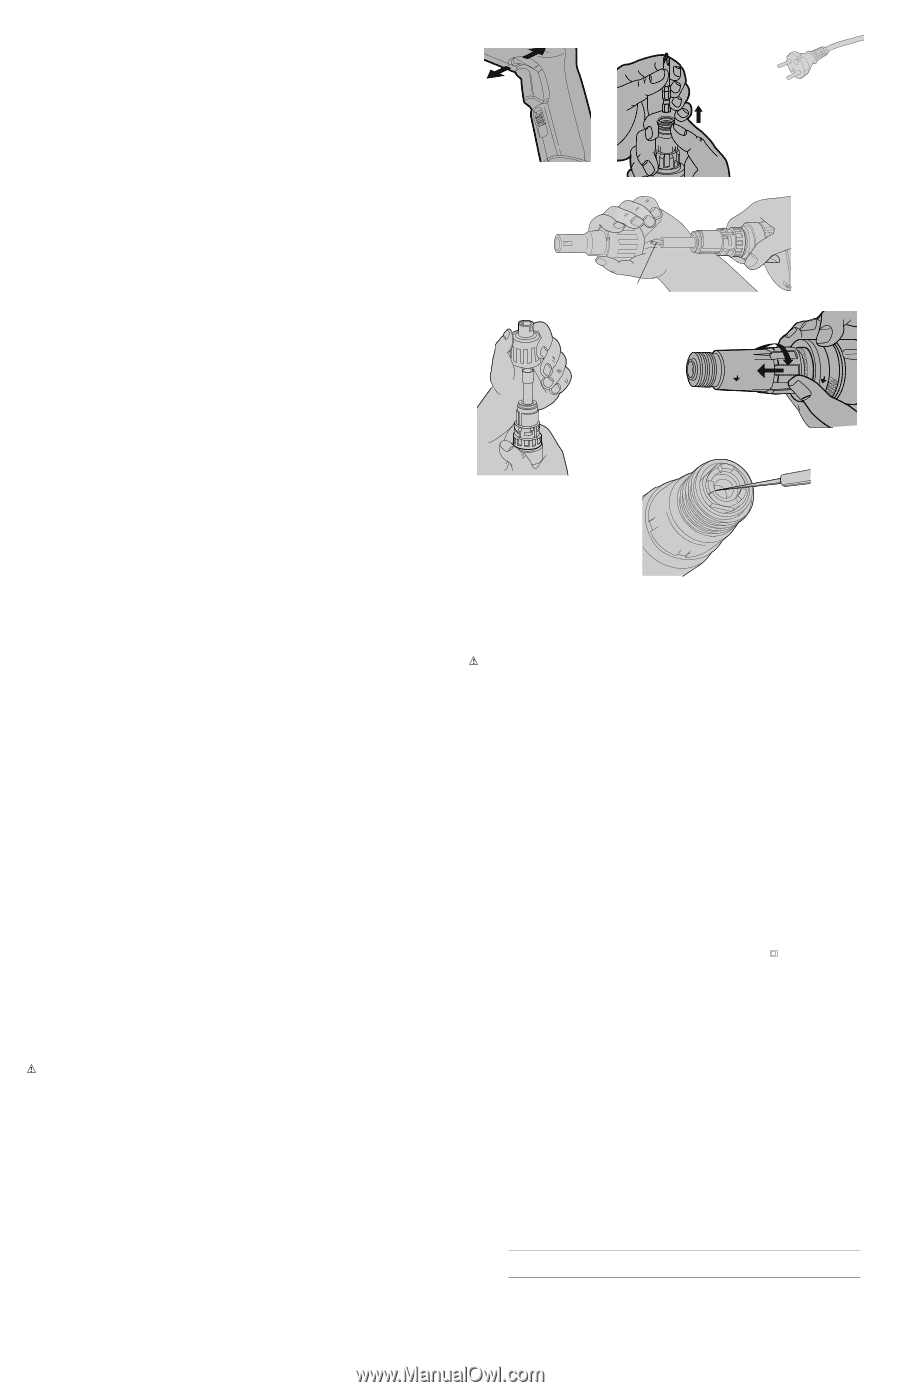 dw268 de walt wiring diagrams